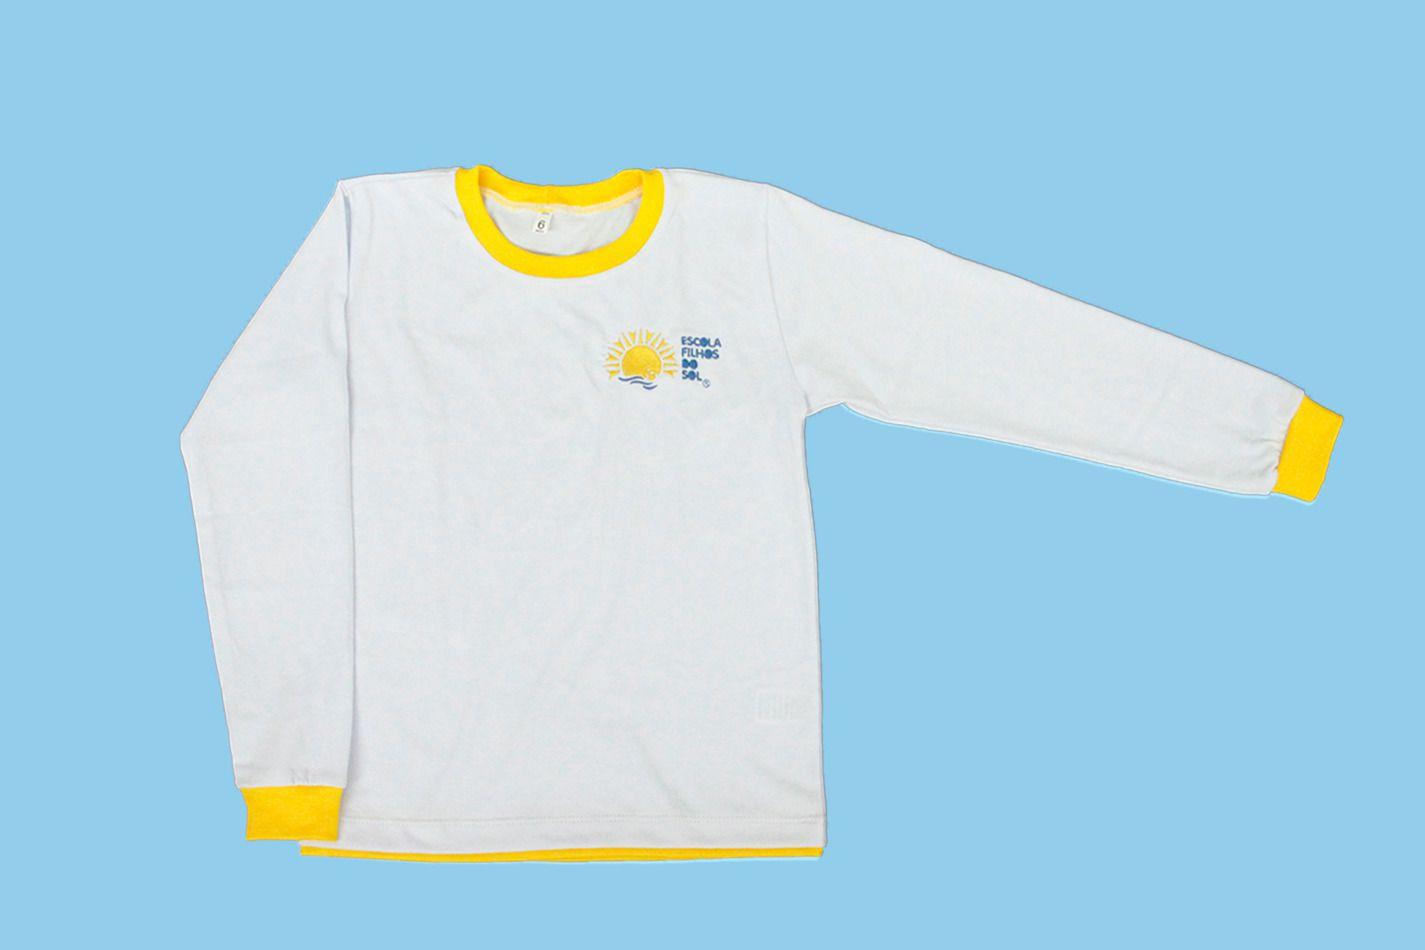 Camiseta Manga Longa Branco Filhos do Sol Ensino Fundamental